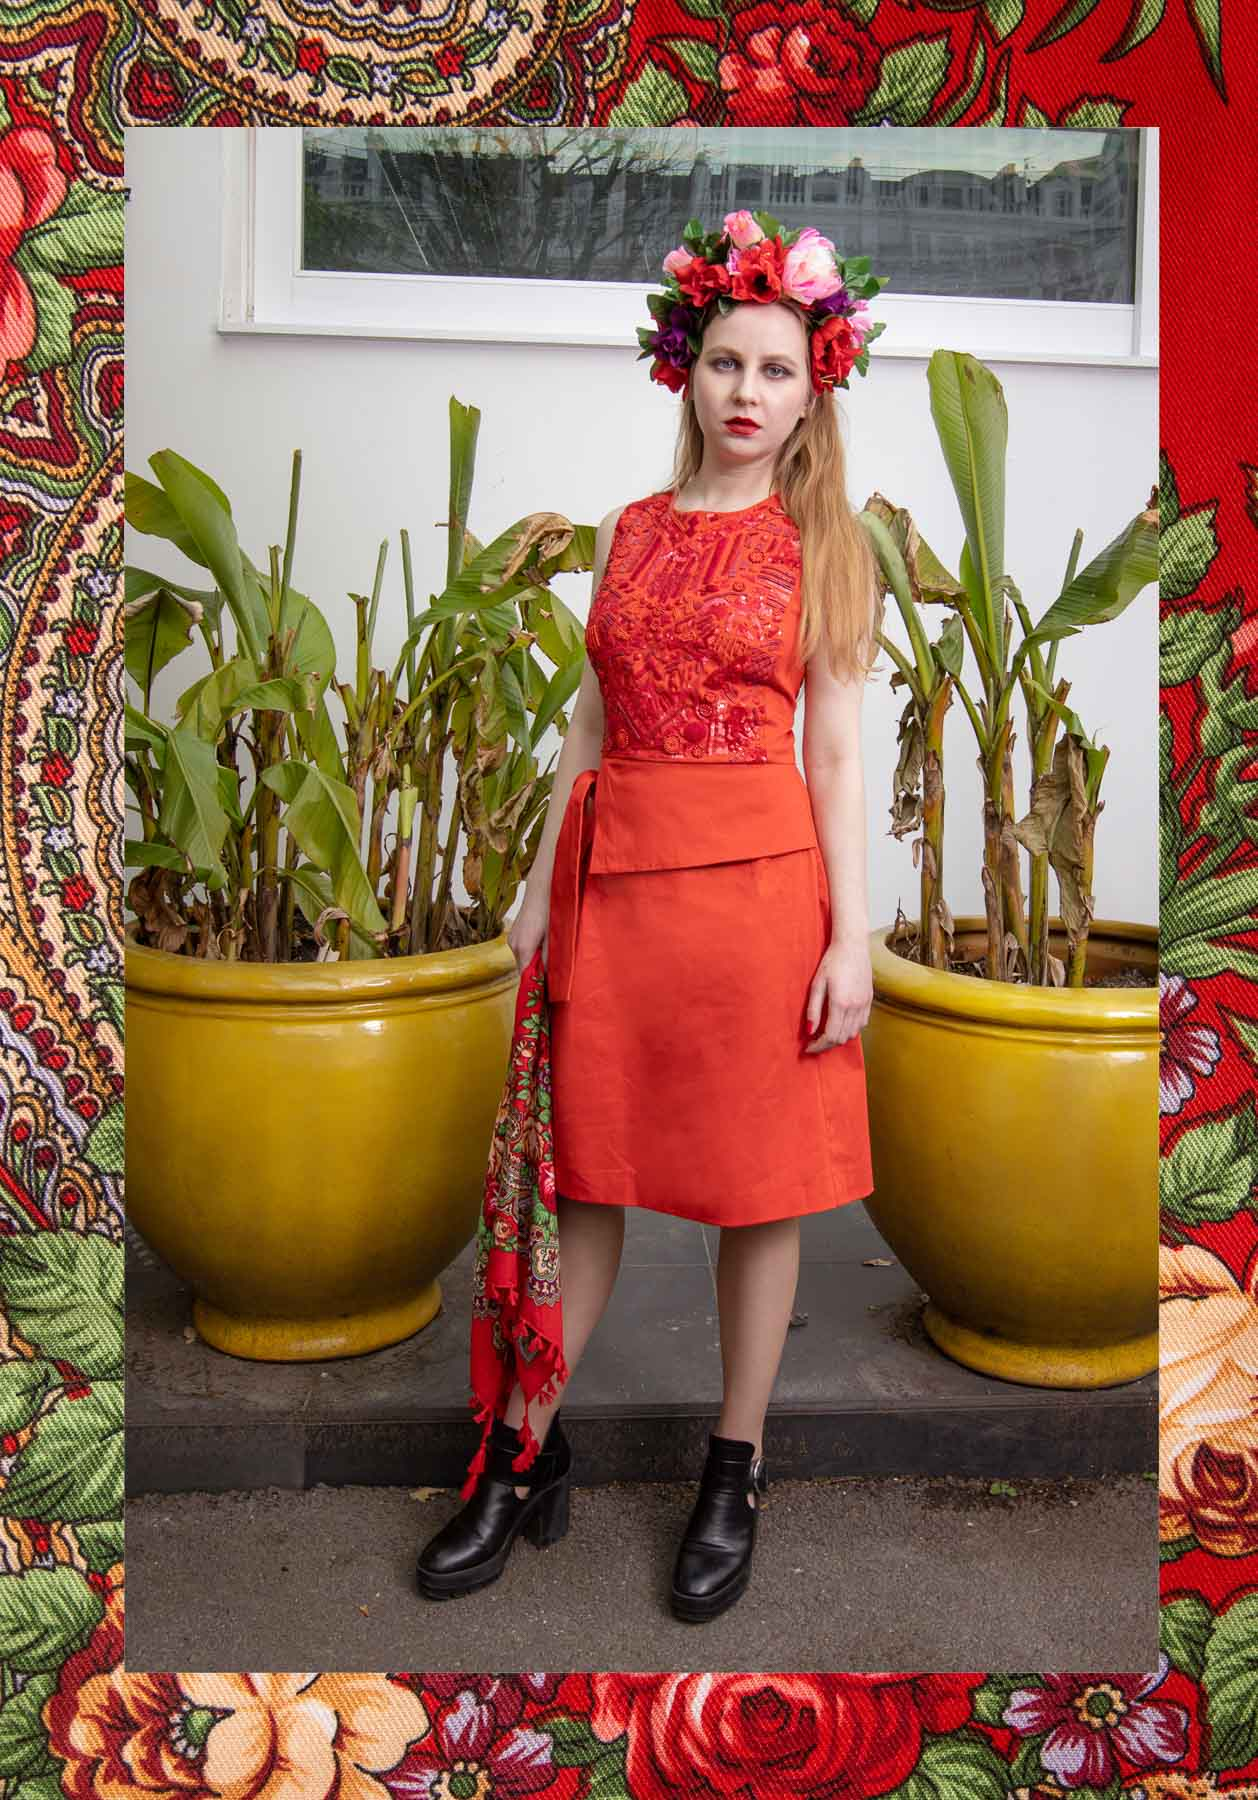 Russian-style-fashion-photographer-london-floral-Русский-стиль-мода-павловопосадский-платок-natalia-smith-photography-0074.jpg